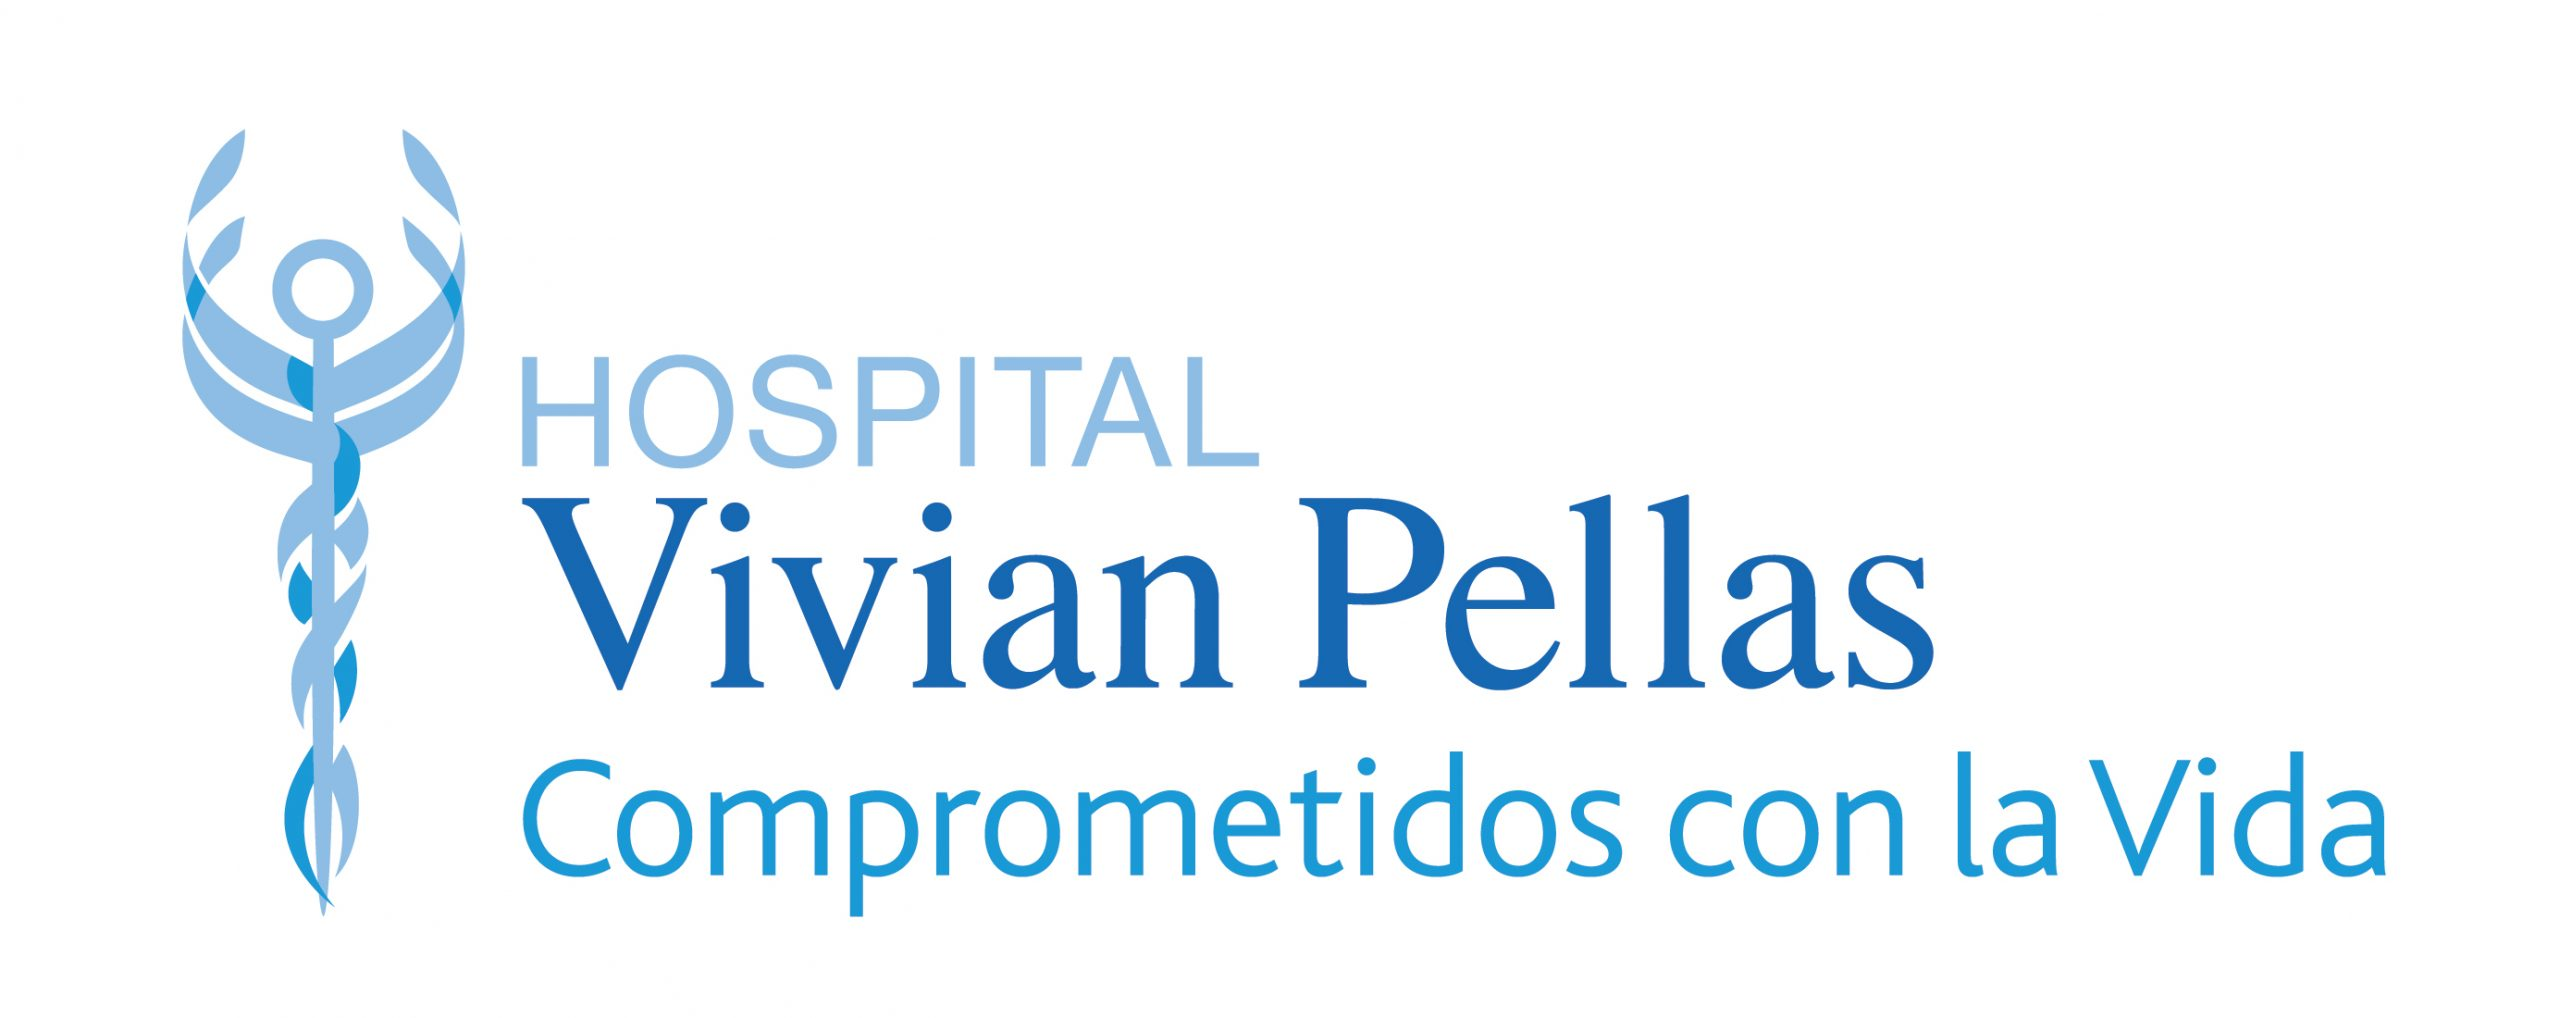 Imagotipo_Hospital_Vivian_Pellas